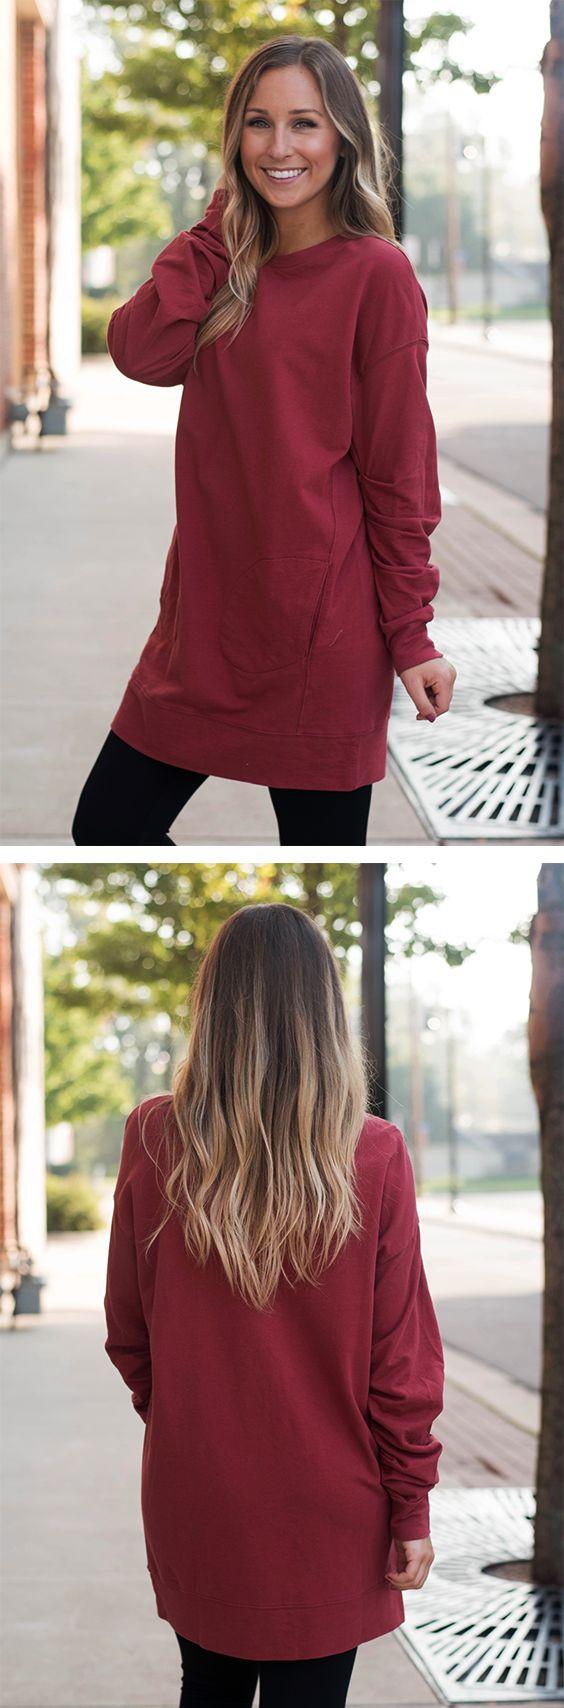 Red Pocket Sweatshirt Tunic | Lane 201 Boutique